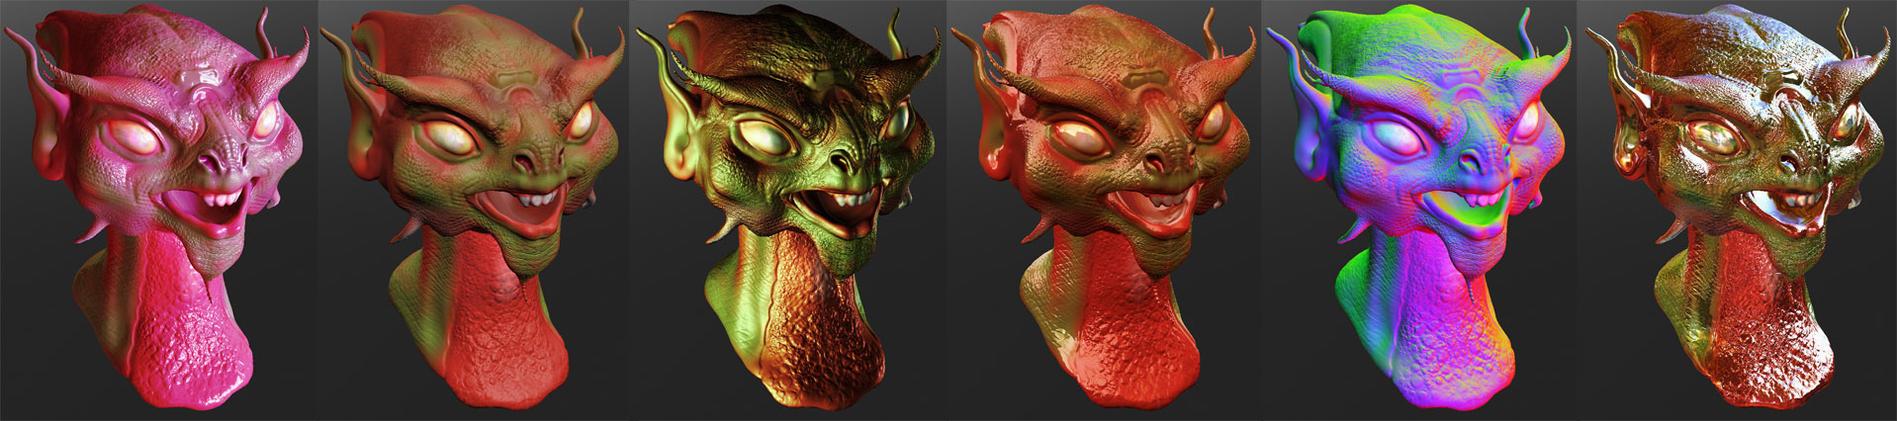 Sculptris Creature Shaders by fernandoreinicke on DeviantArt